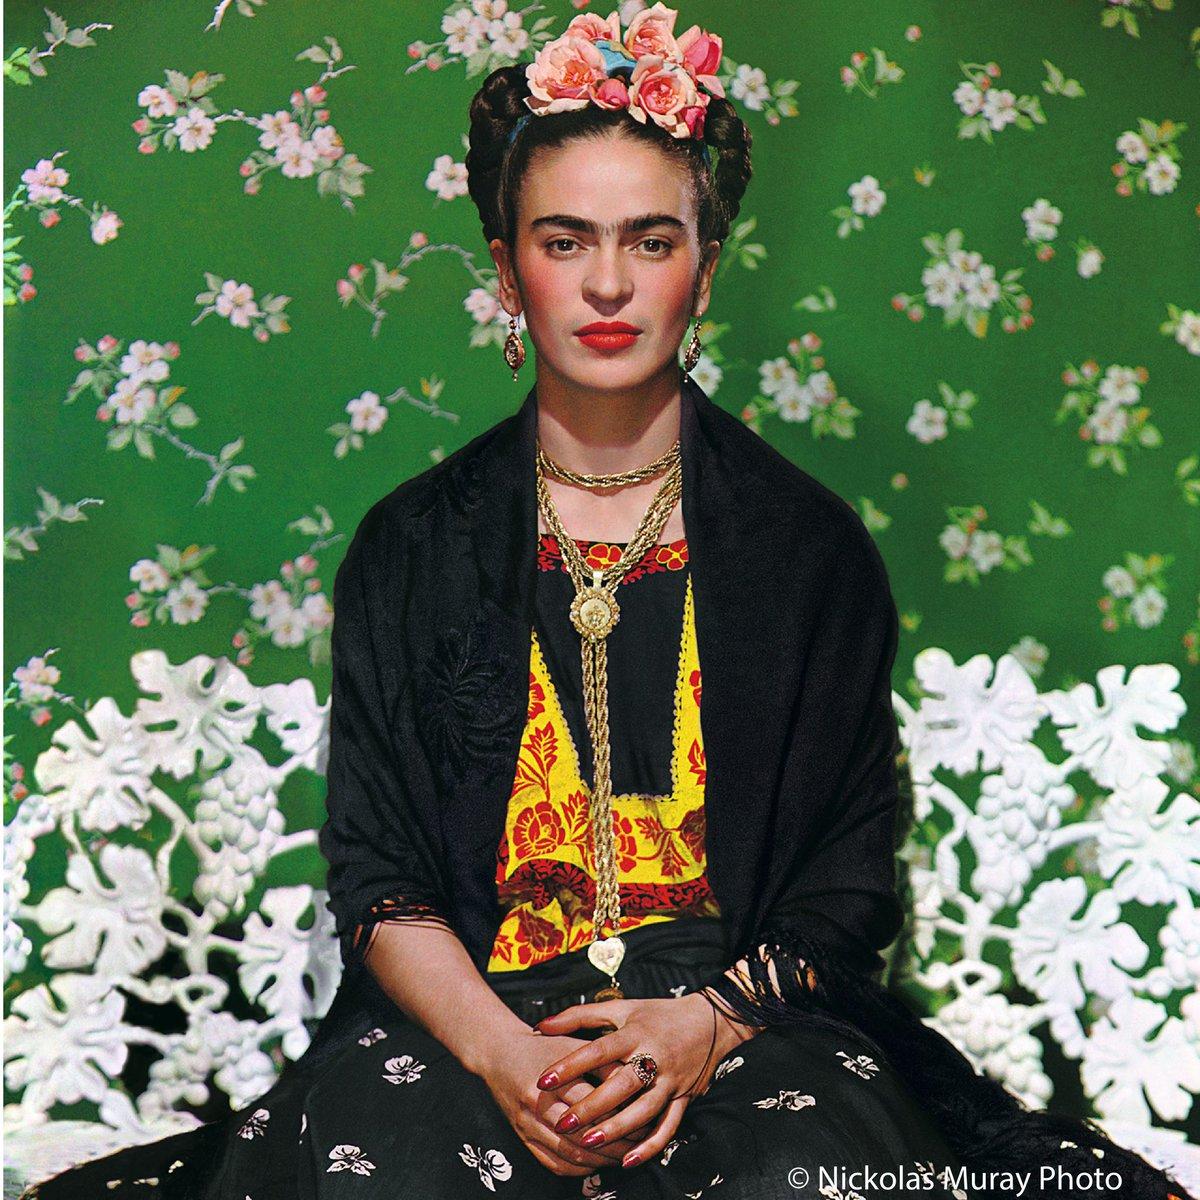 #FridaKahlo